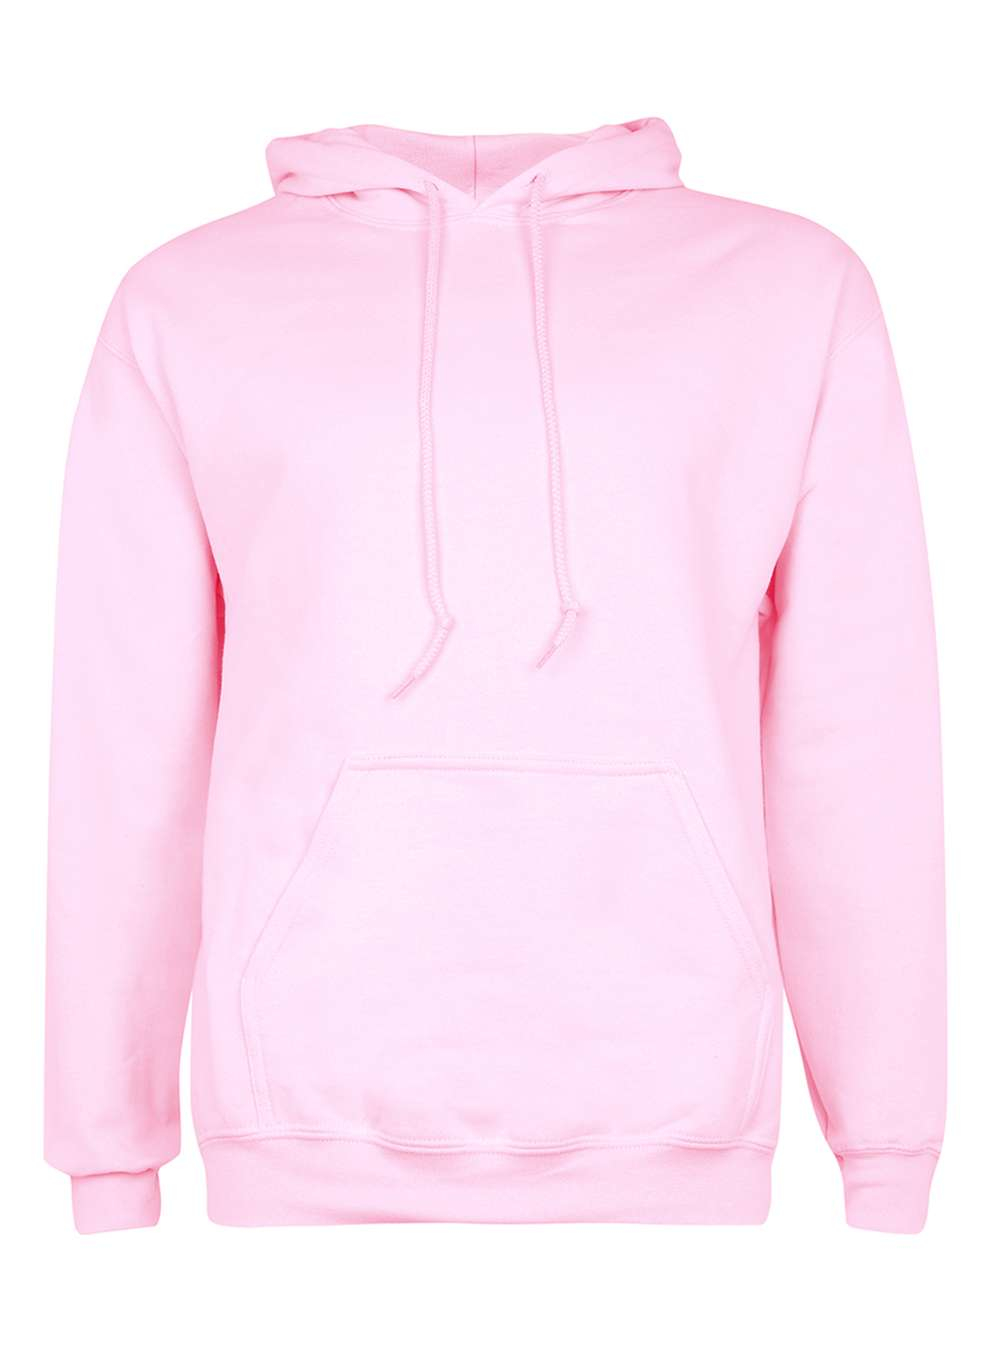 Topman Pink Oversized Hoodie In For Men Lyst